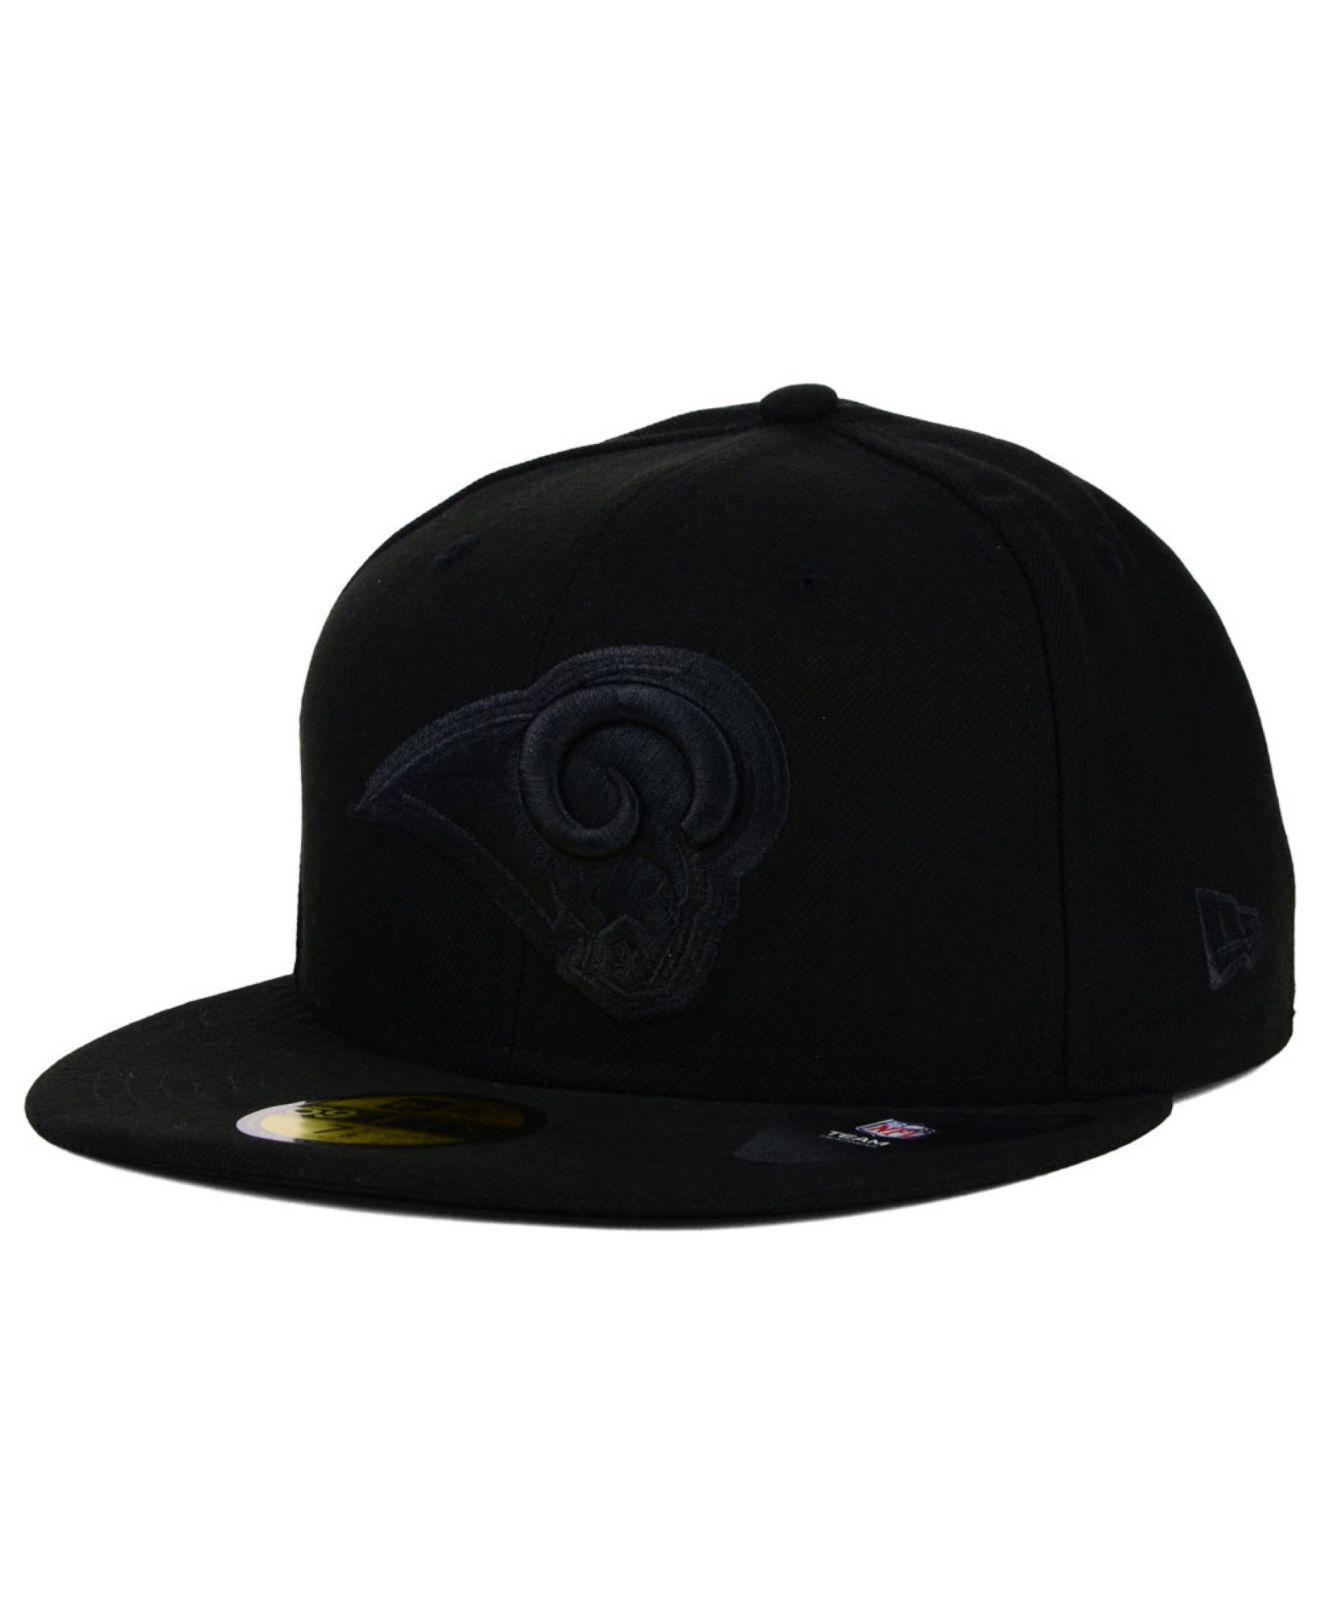 ... czech lyst ktz los angeles rams black on black 59fifty cap in black for  men 0d4b2 wholesale exclusive new era 9fifty los angeles rams script ... 79ab31efb